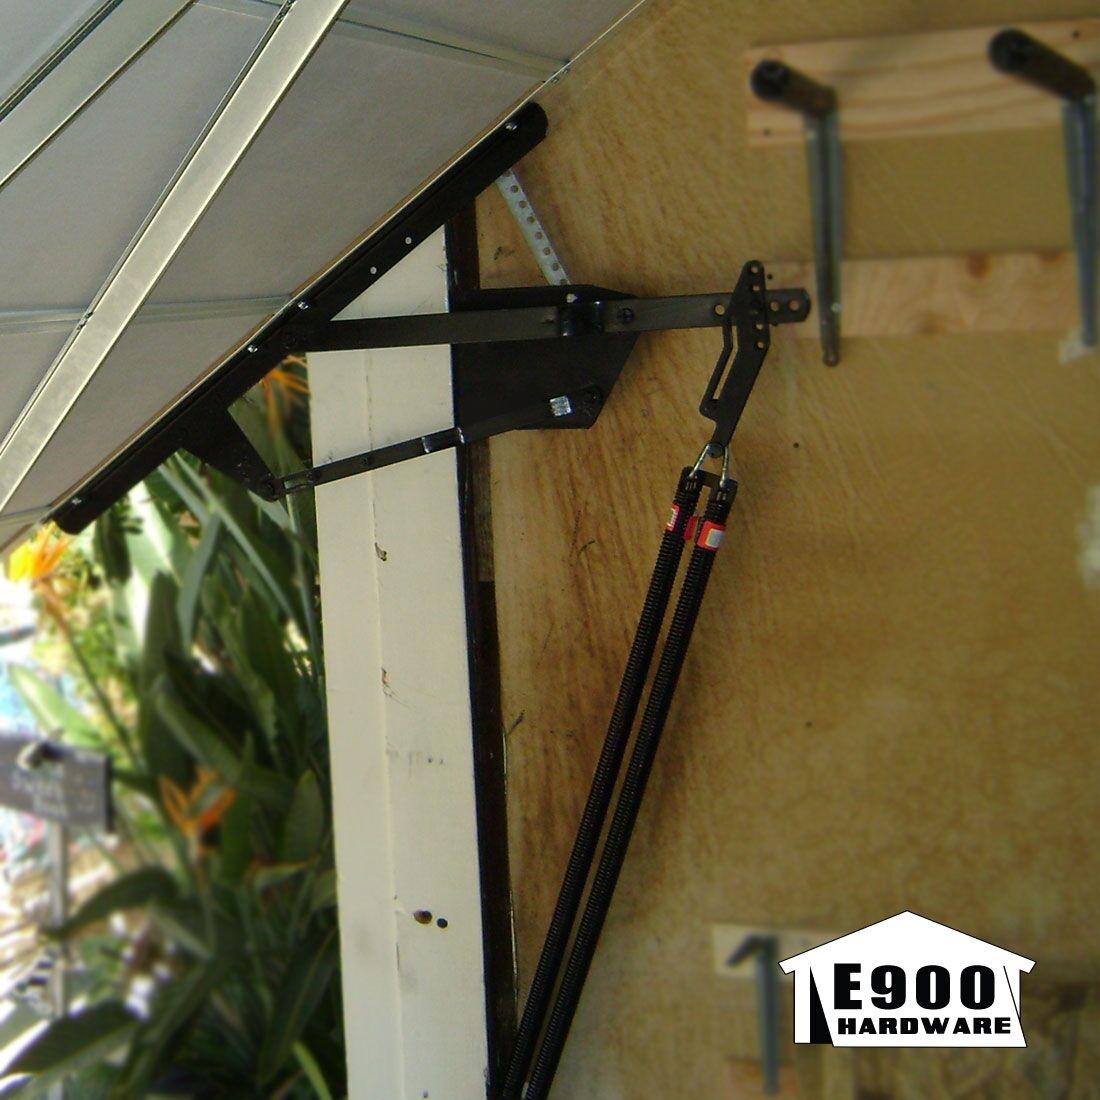 P332 32 inch plug end spring for one piece garage doors for Spring king garage door